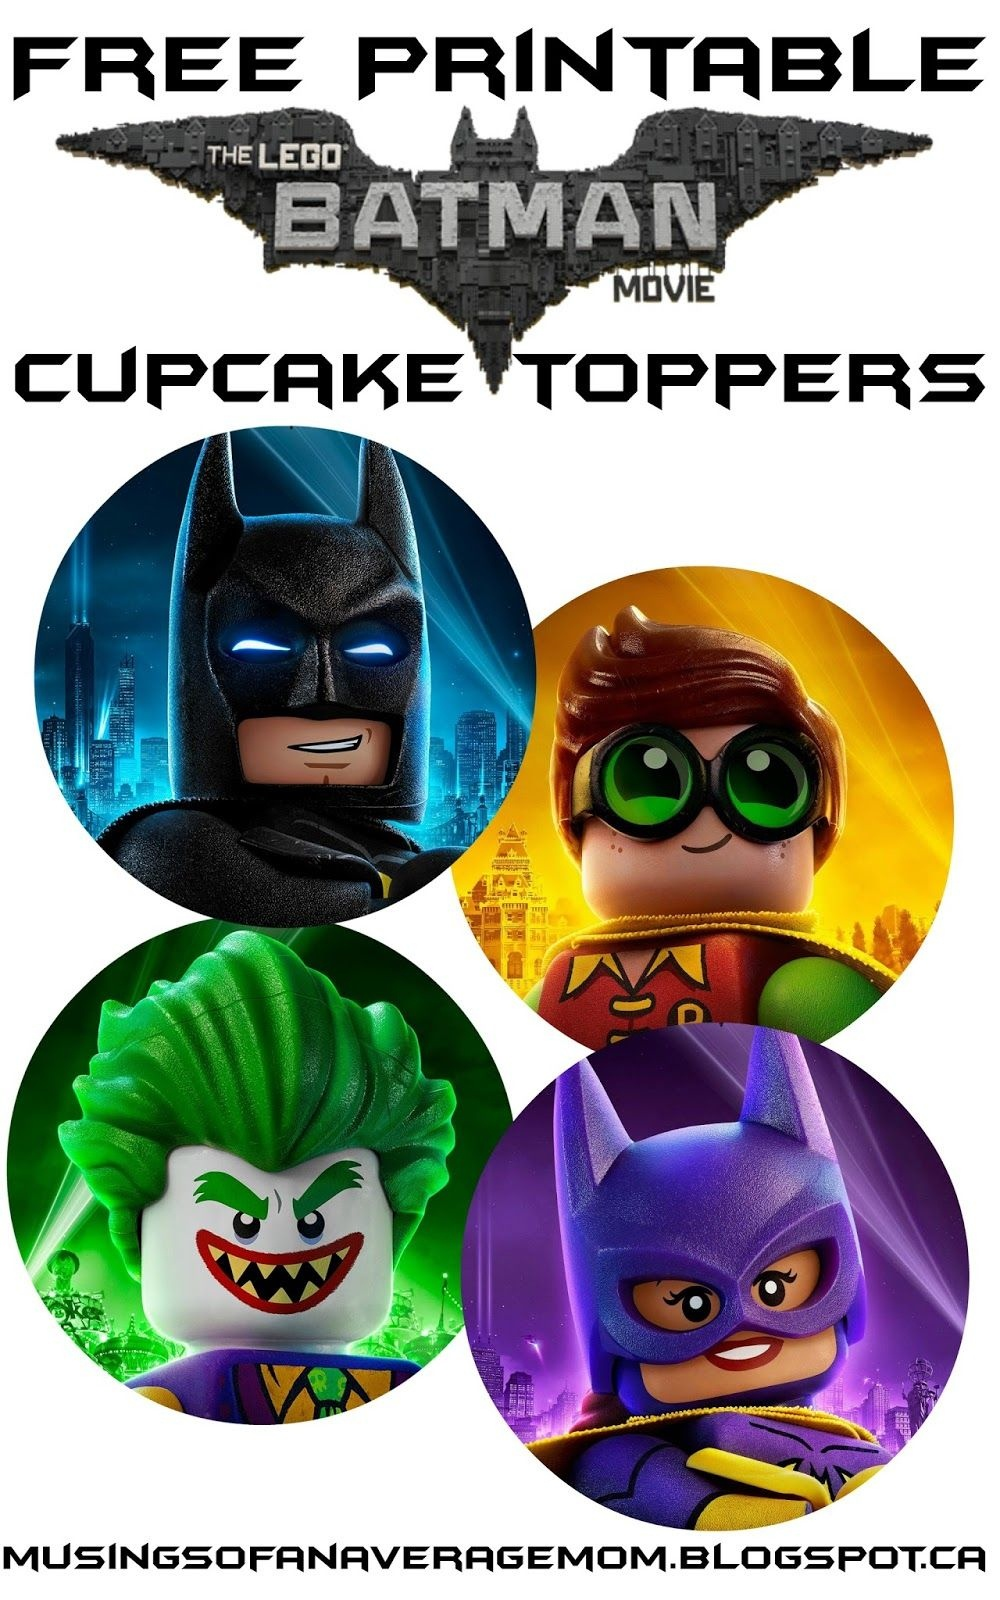 Free Lego Batman Cupcake Toppers | Daniel Bday Theme Ideas | Lego - Free Printable Lego Batman